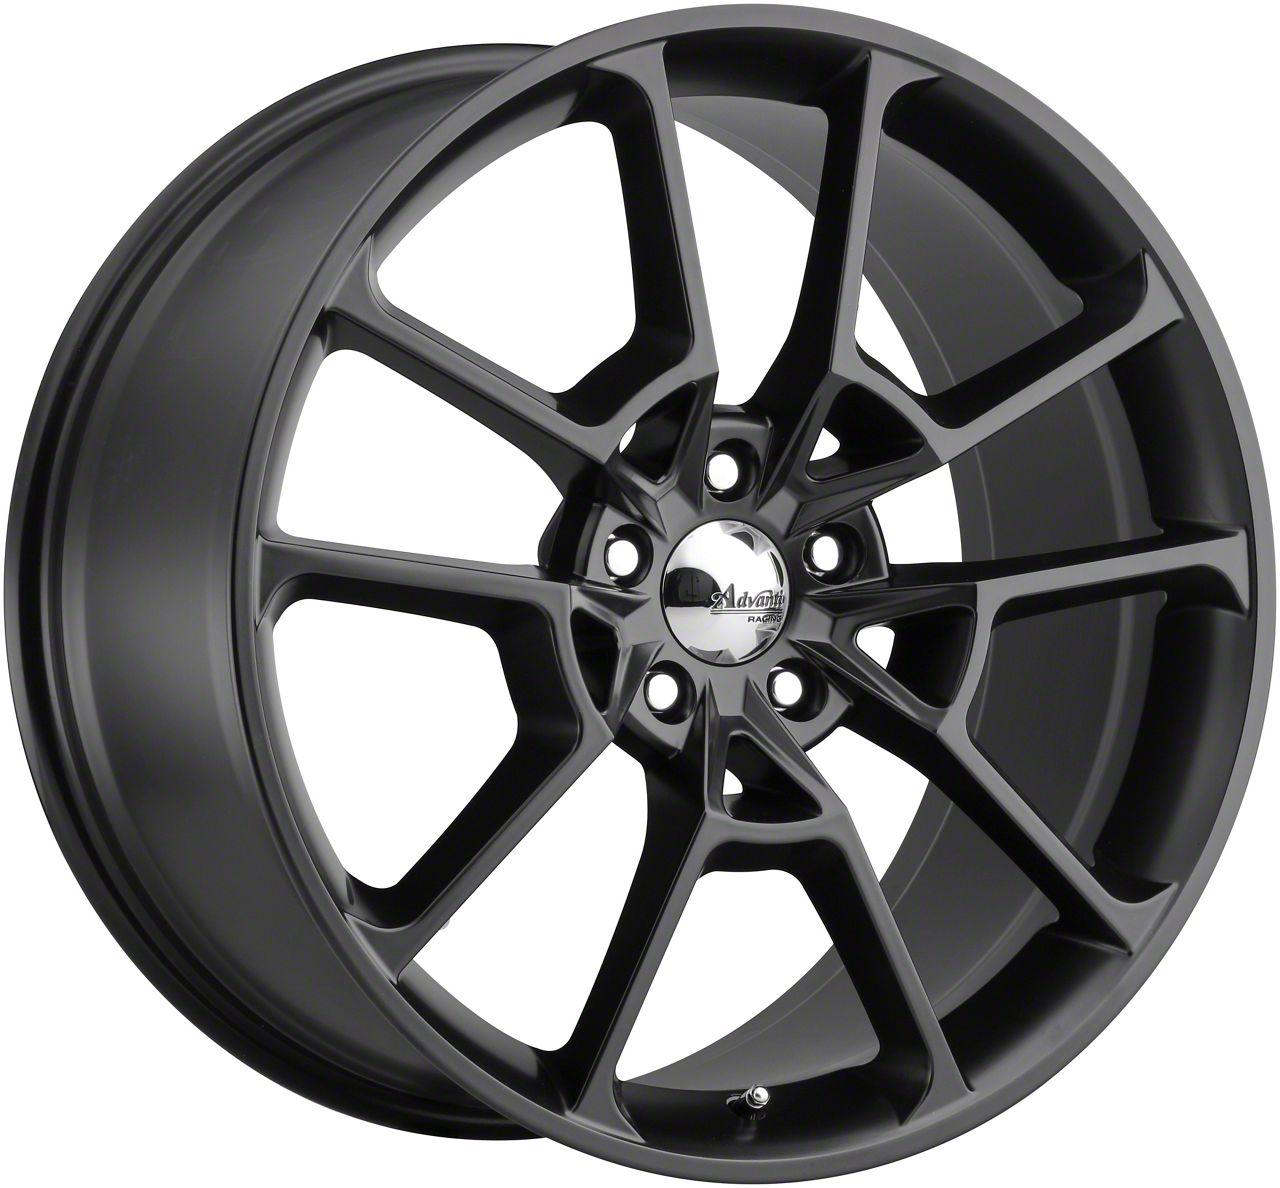 Advanti Fury Matte Black Wheel - 20x9 (15-19 GT, EcoBoost, V6)